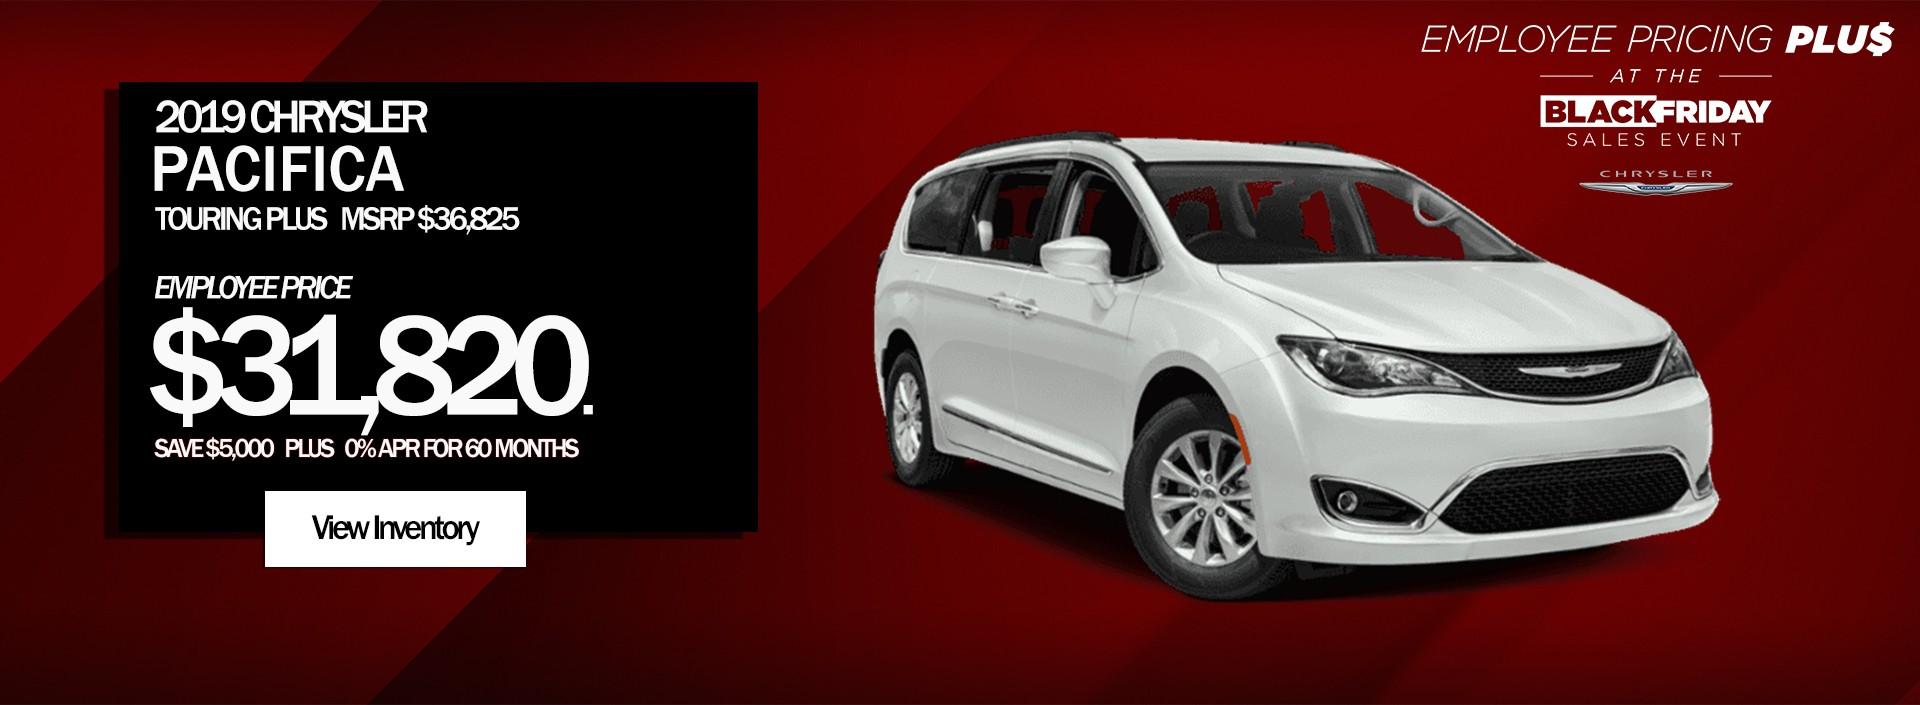 Chrysler Black Friday Deals